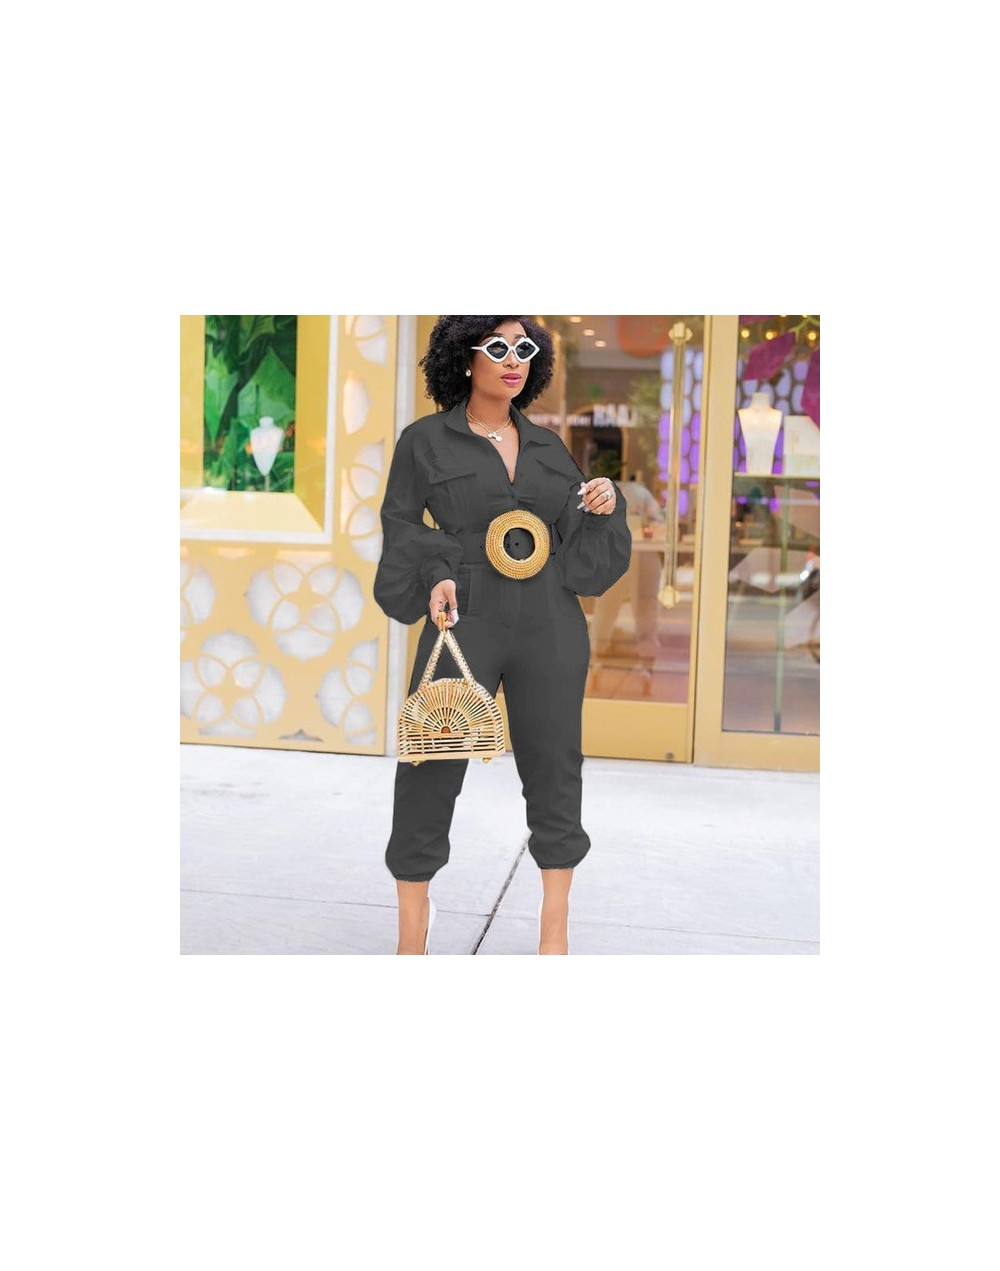 New Autumn Women Solid Color Lantern Long Sleeve Button Up Turn Down Neck Jumpsuit Female Fashion Elegant Romper Playsuit 20...